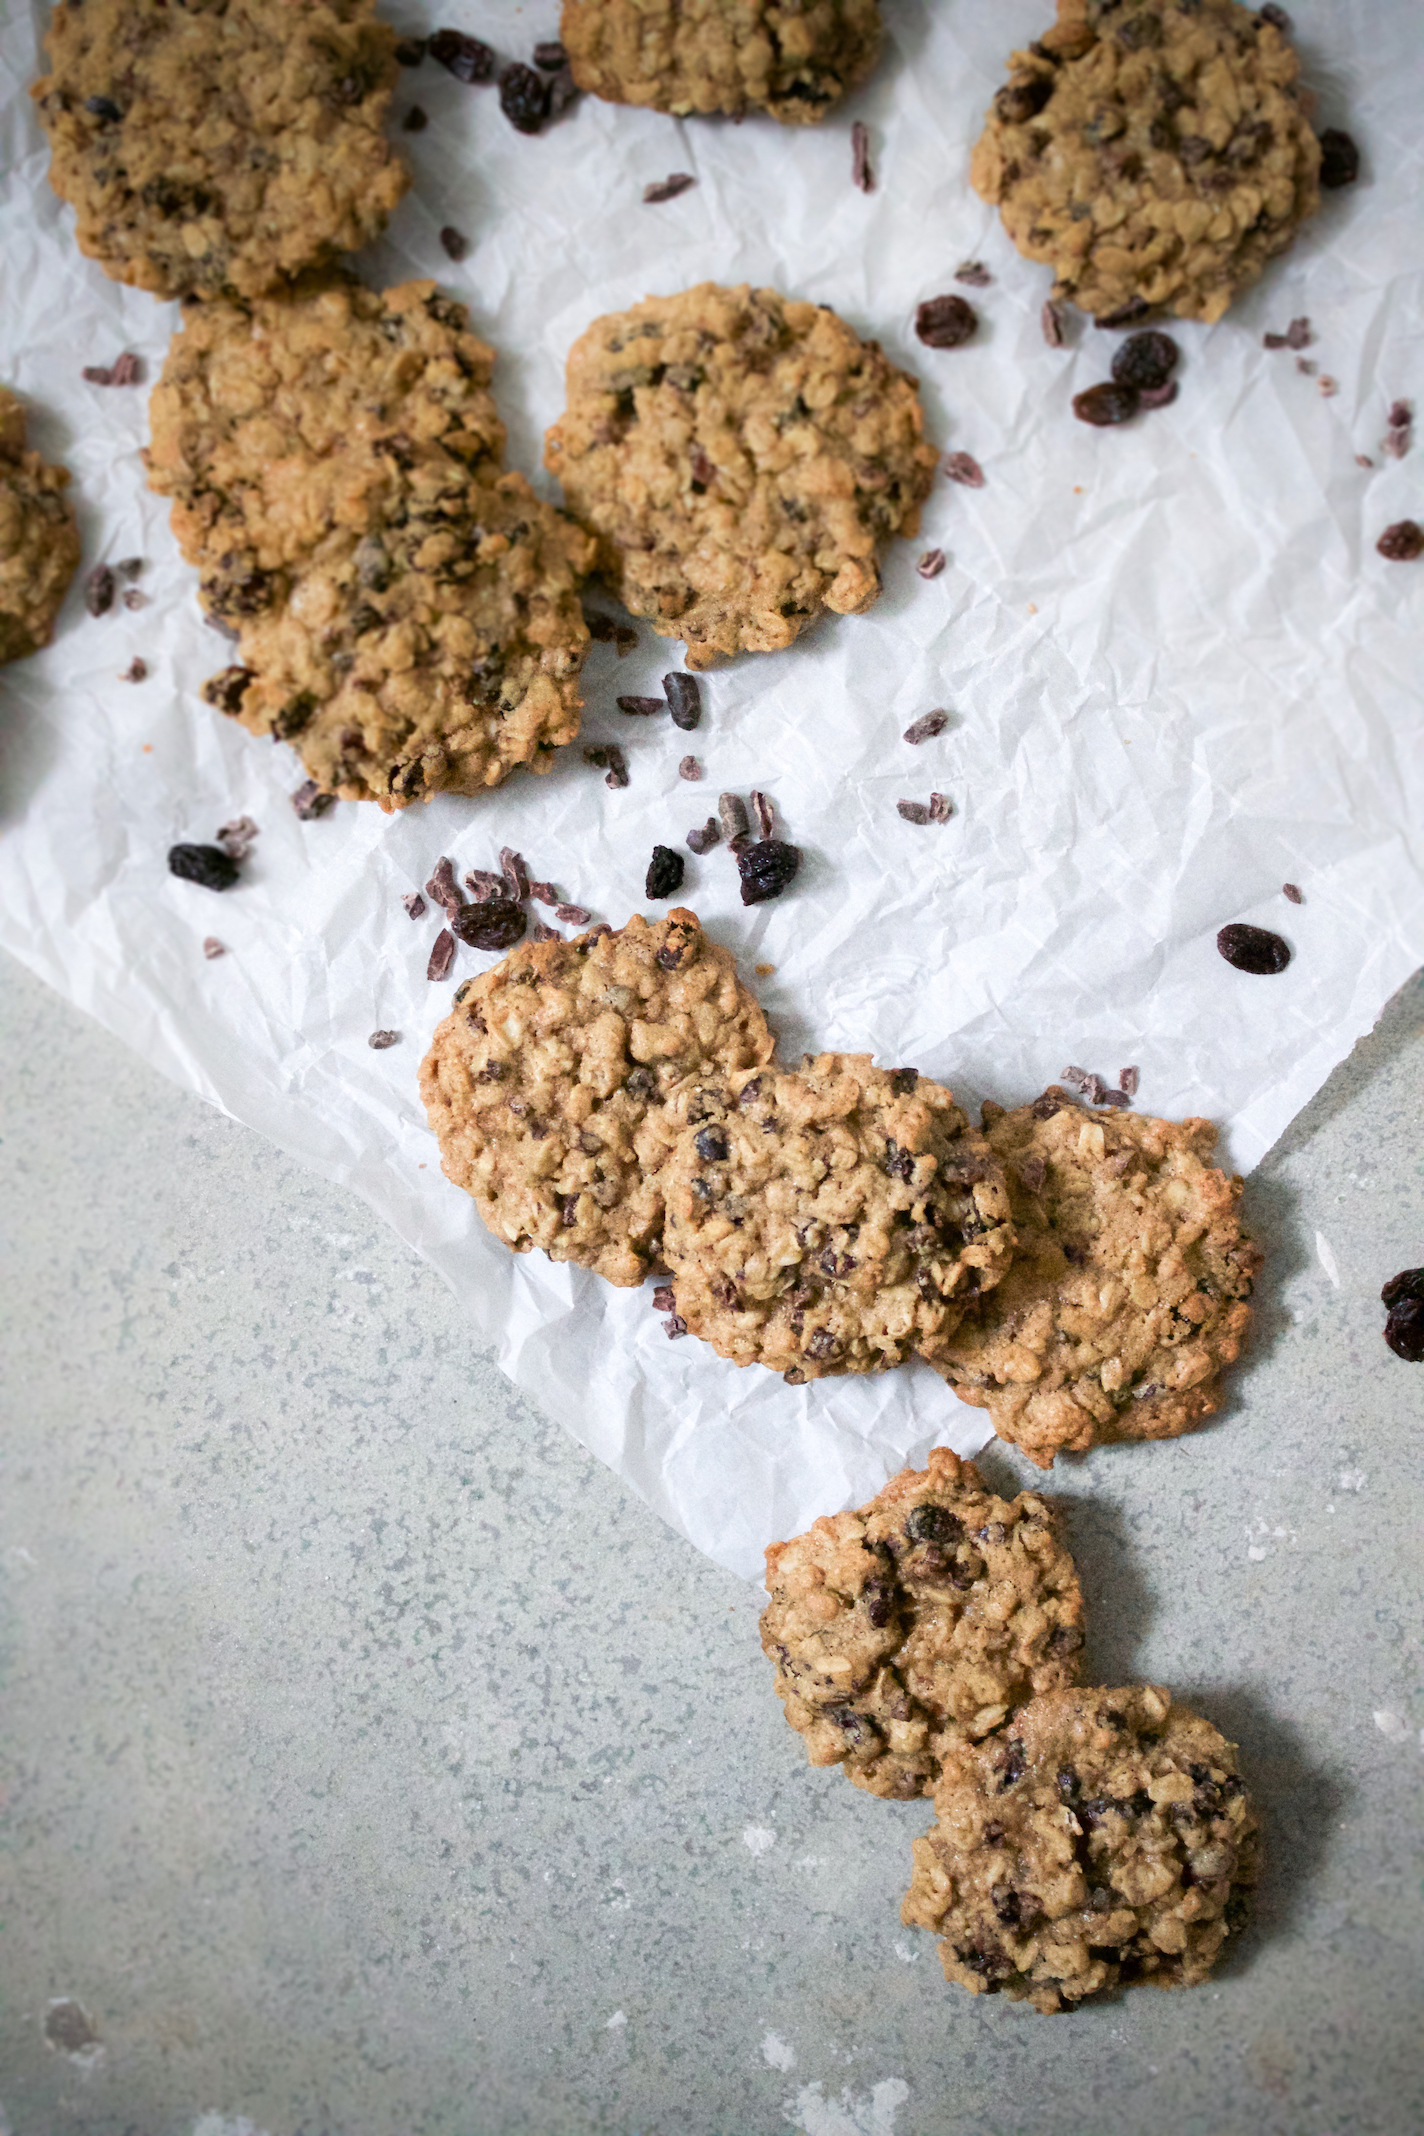 Oatmeal raisin cacao nib cookies 2.jpg